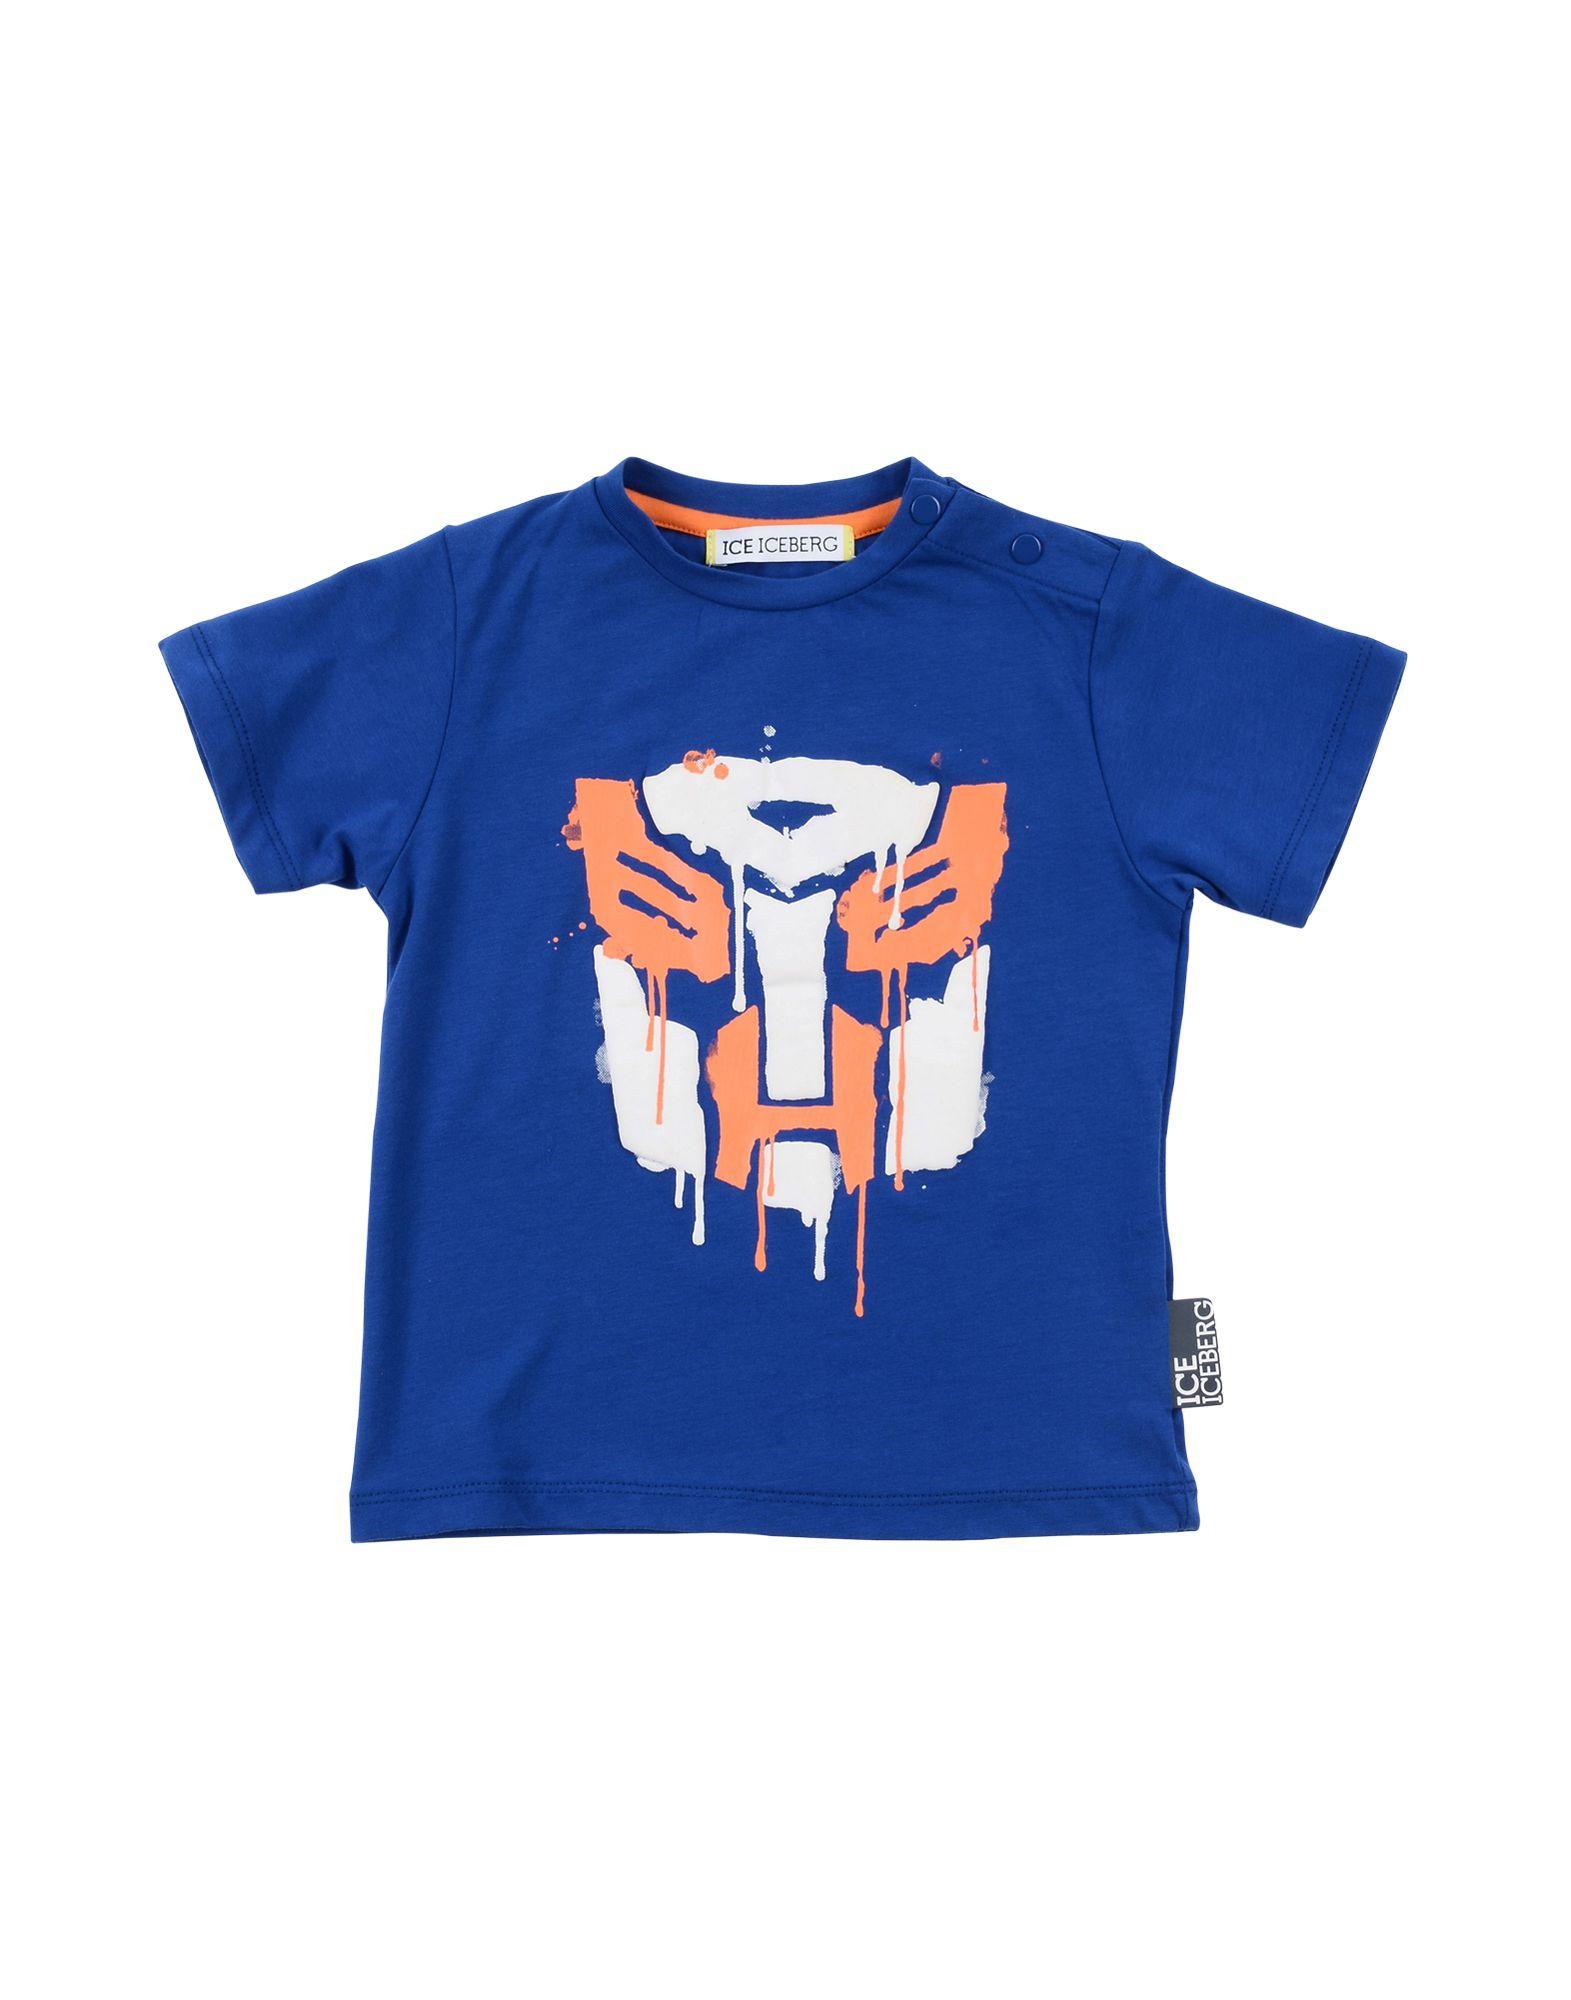 Ice Iceberg Kids' T-shirts In Blue